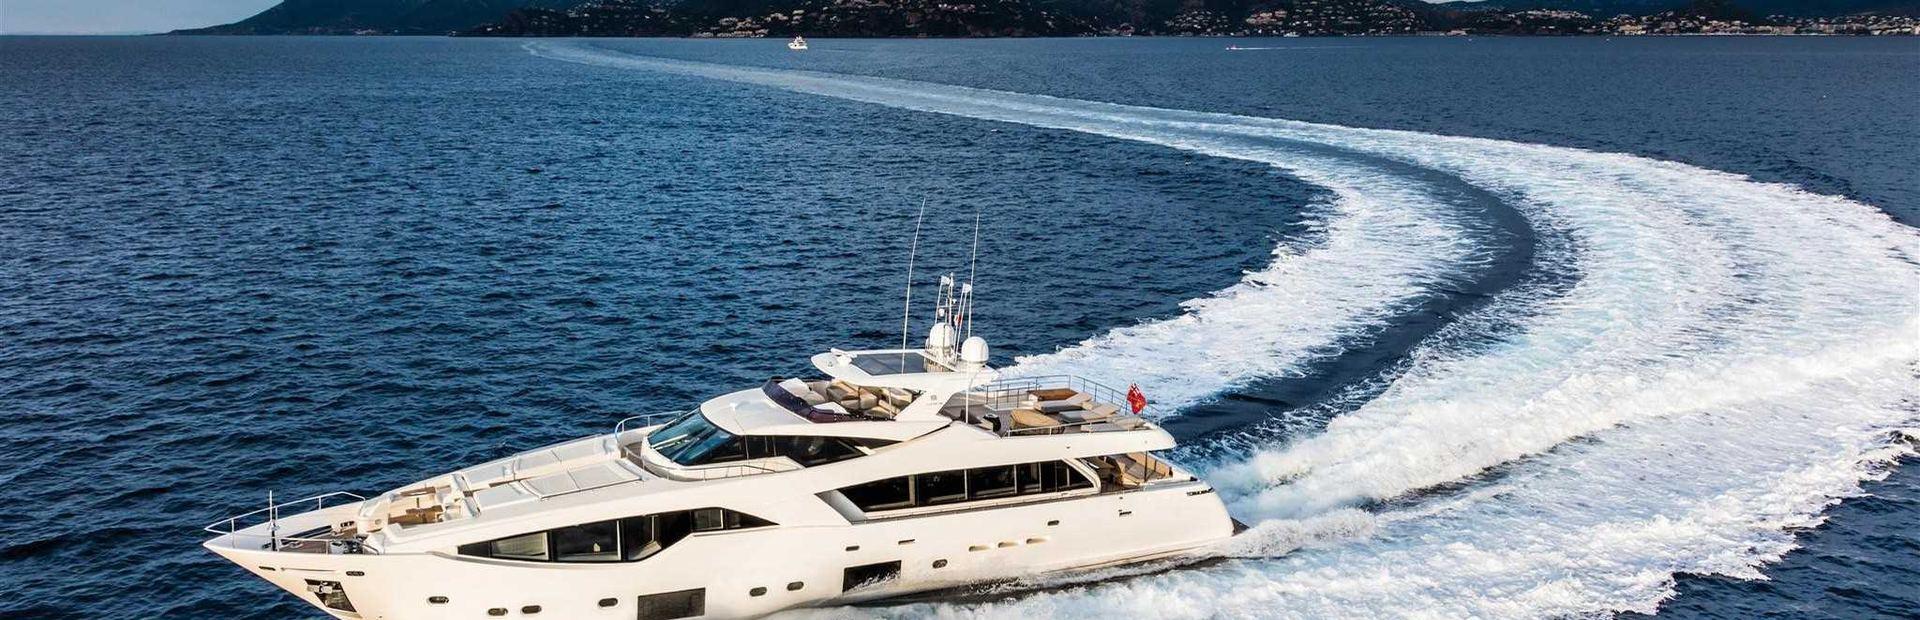 Custom Line 108 Yacht Charter